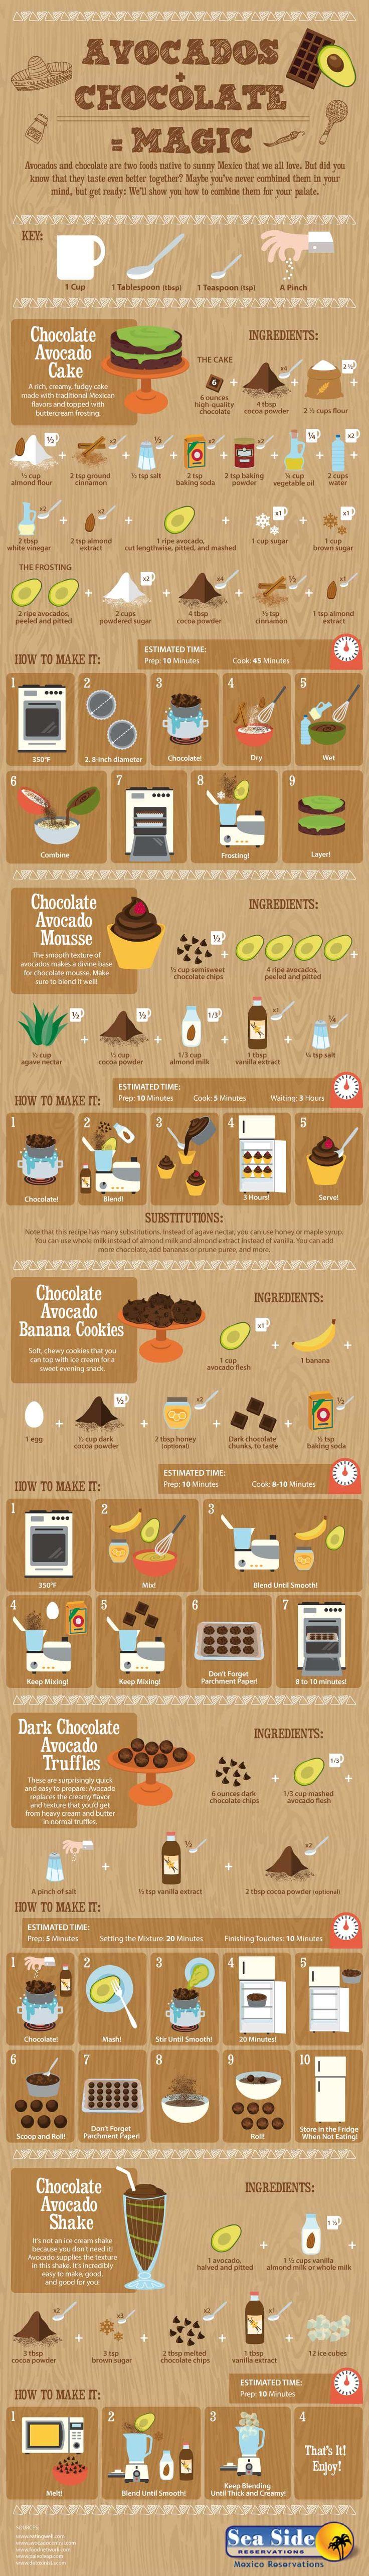 Avocados + Chocolate = Magic! #vegan